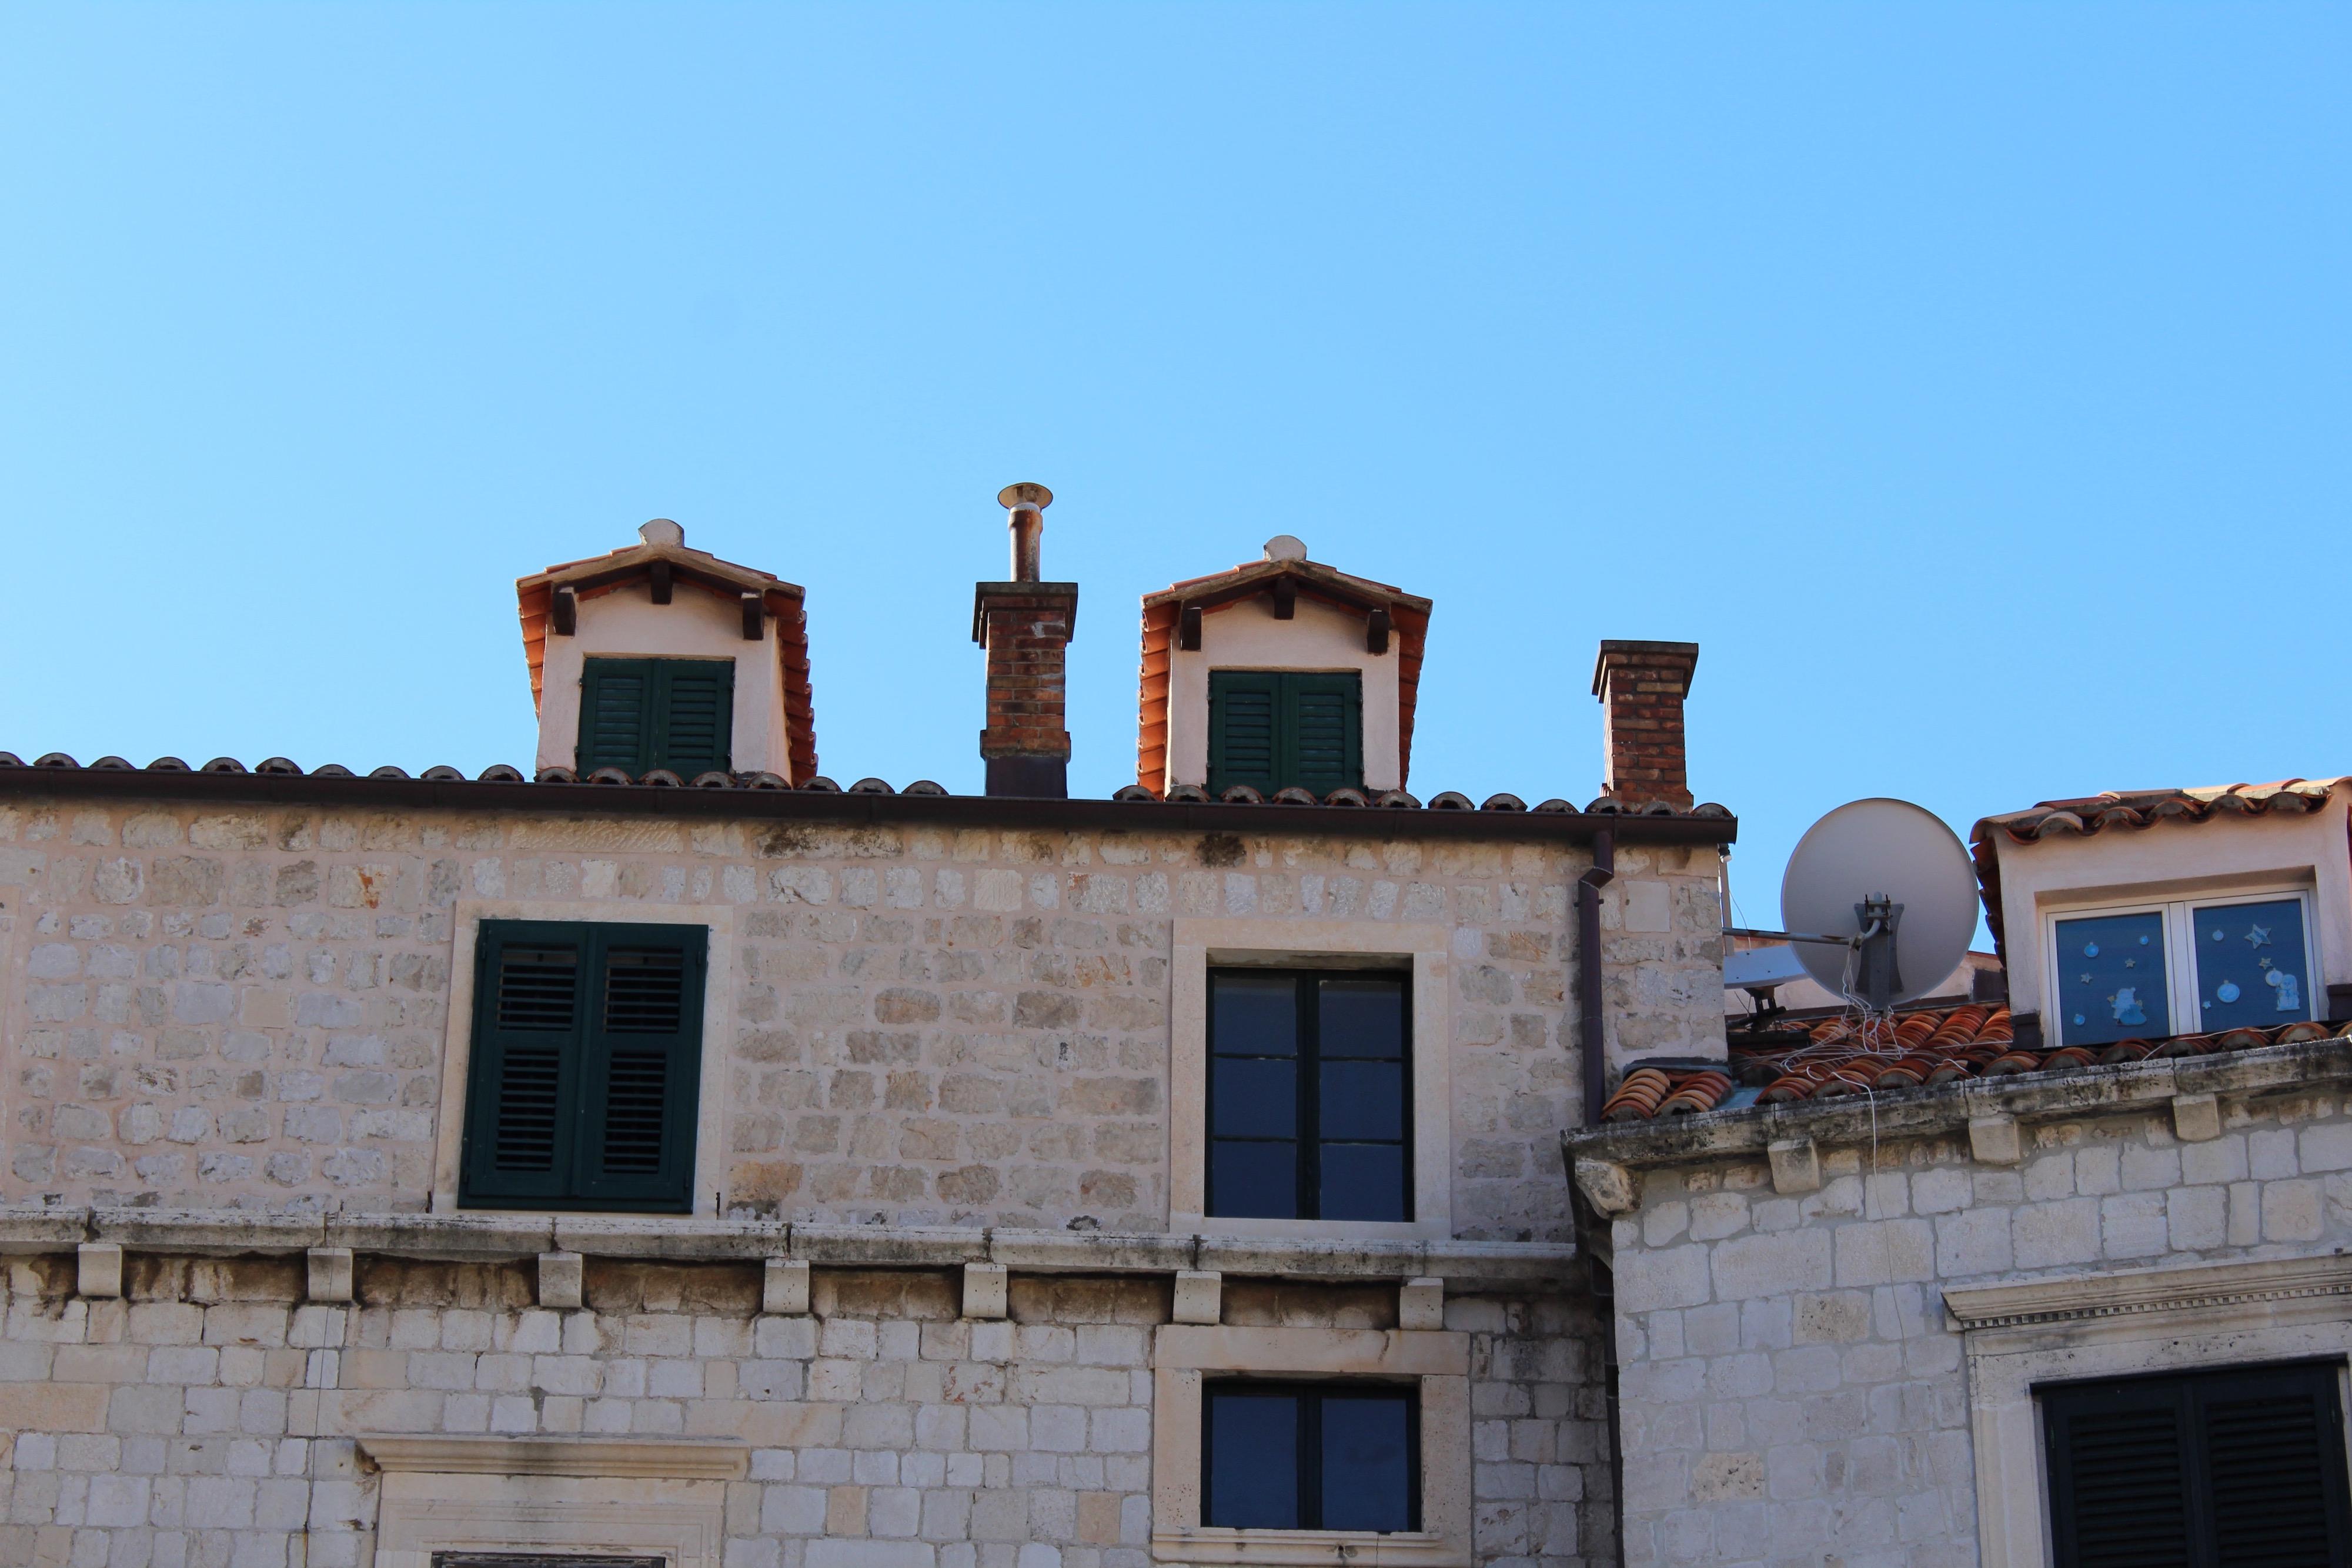 Dans les rues de Dubrovnik